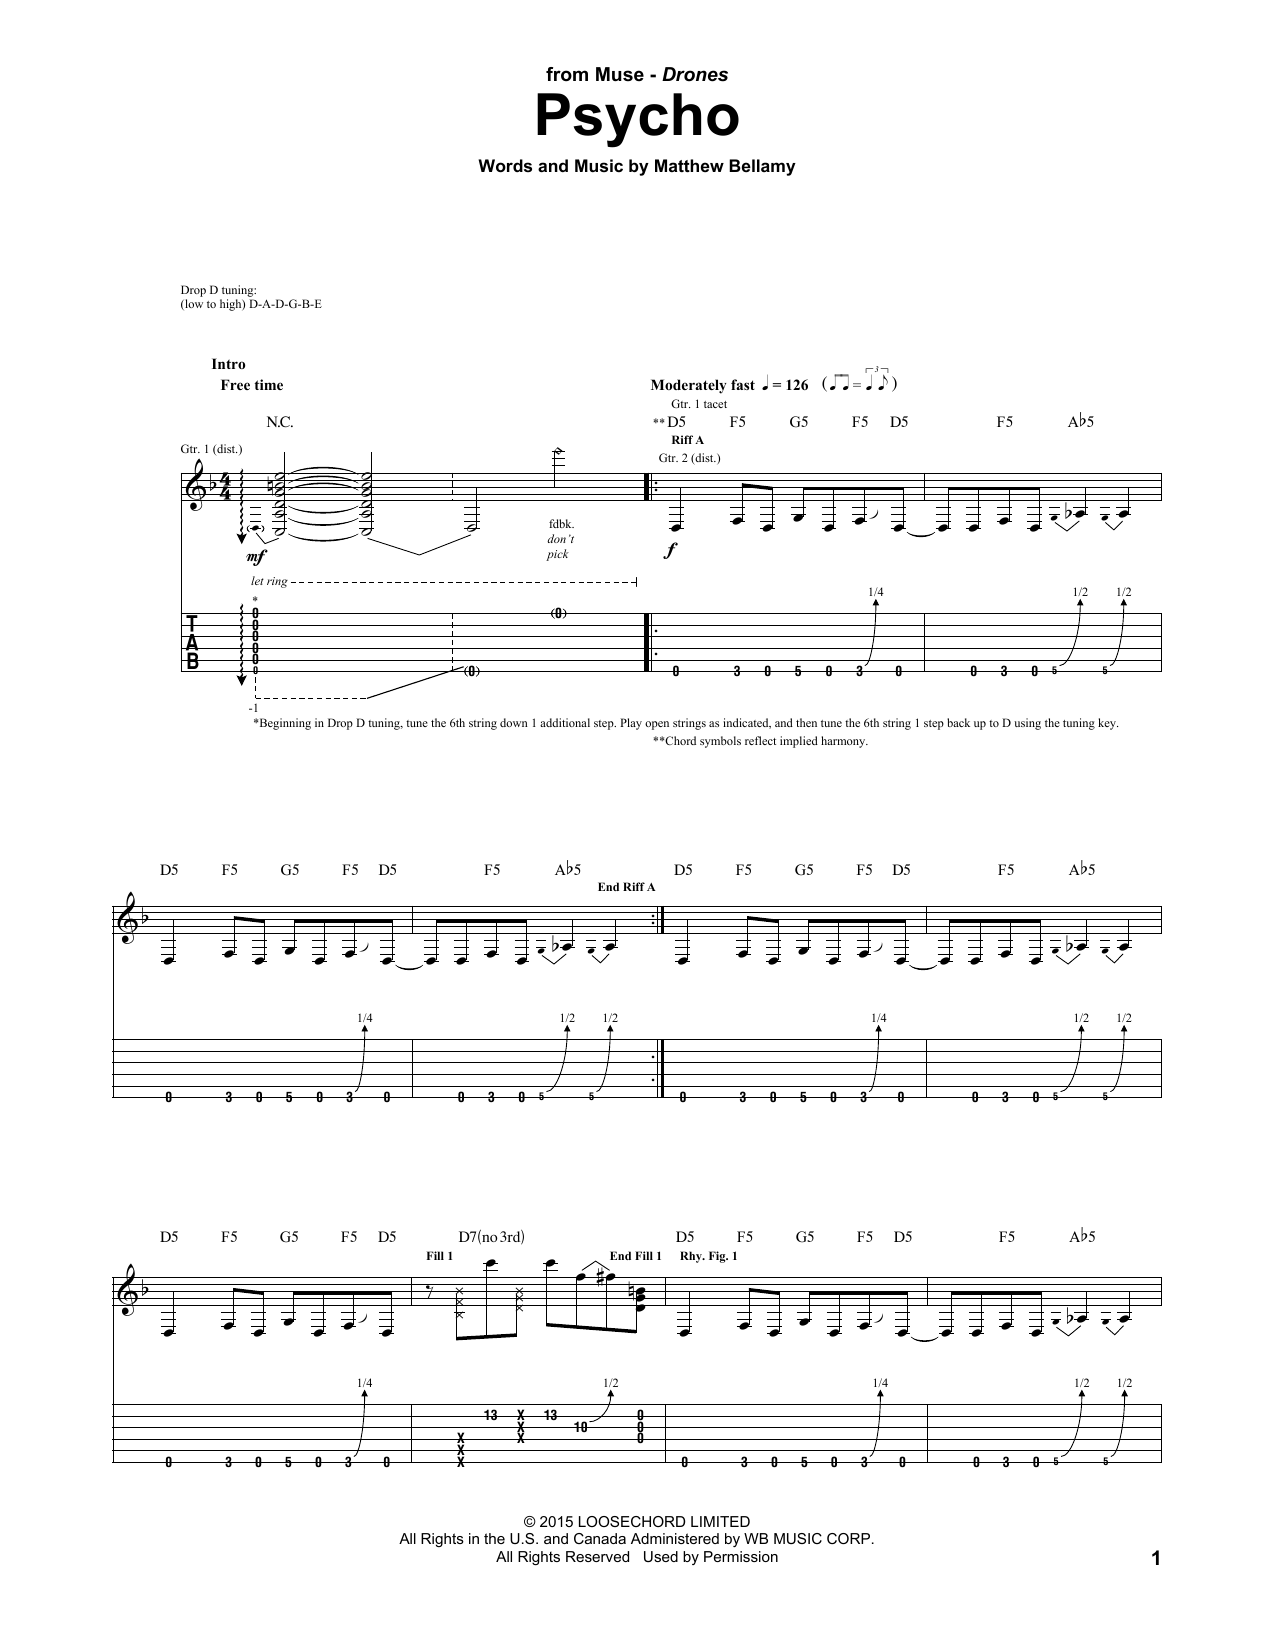 Sheet Music Digital Files To Print Licensed Muse Digital Sheet Music